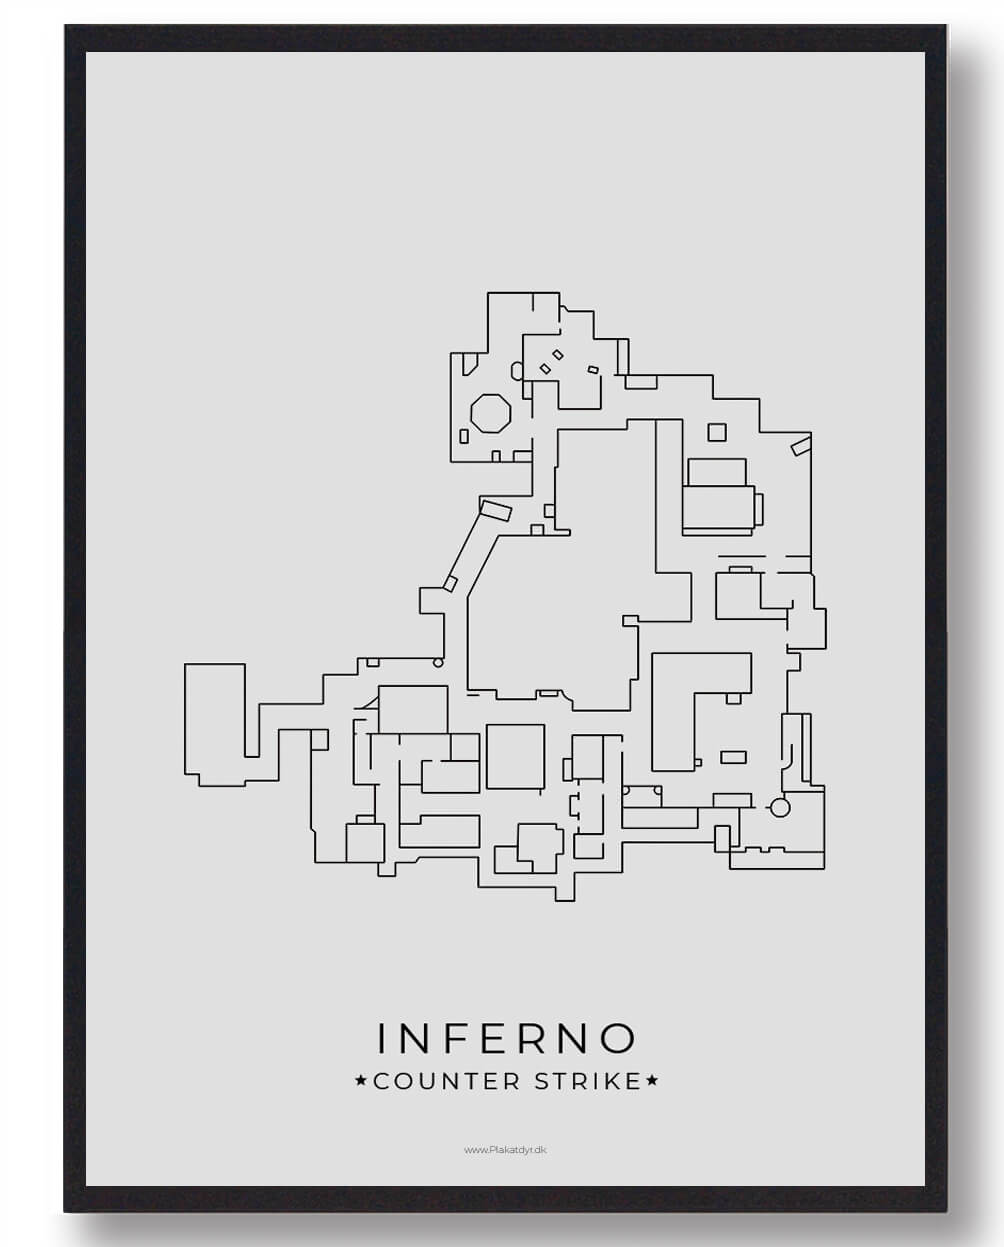 Inferno-map-csgo